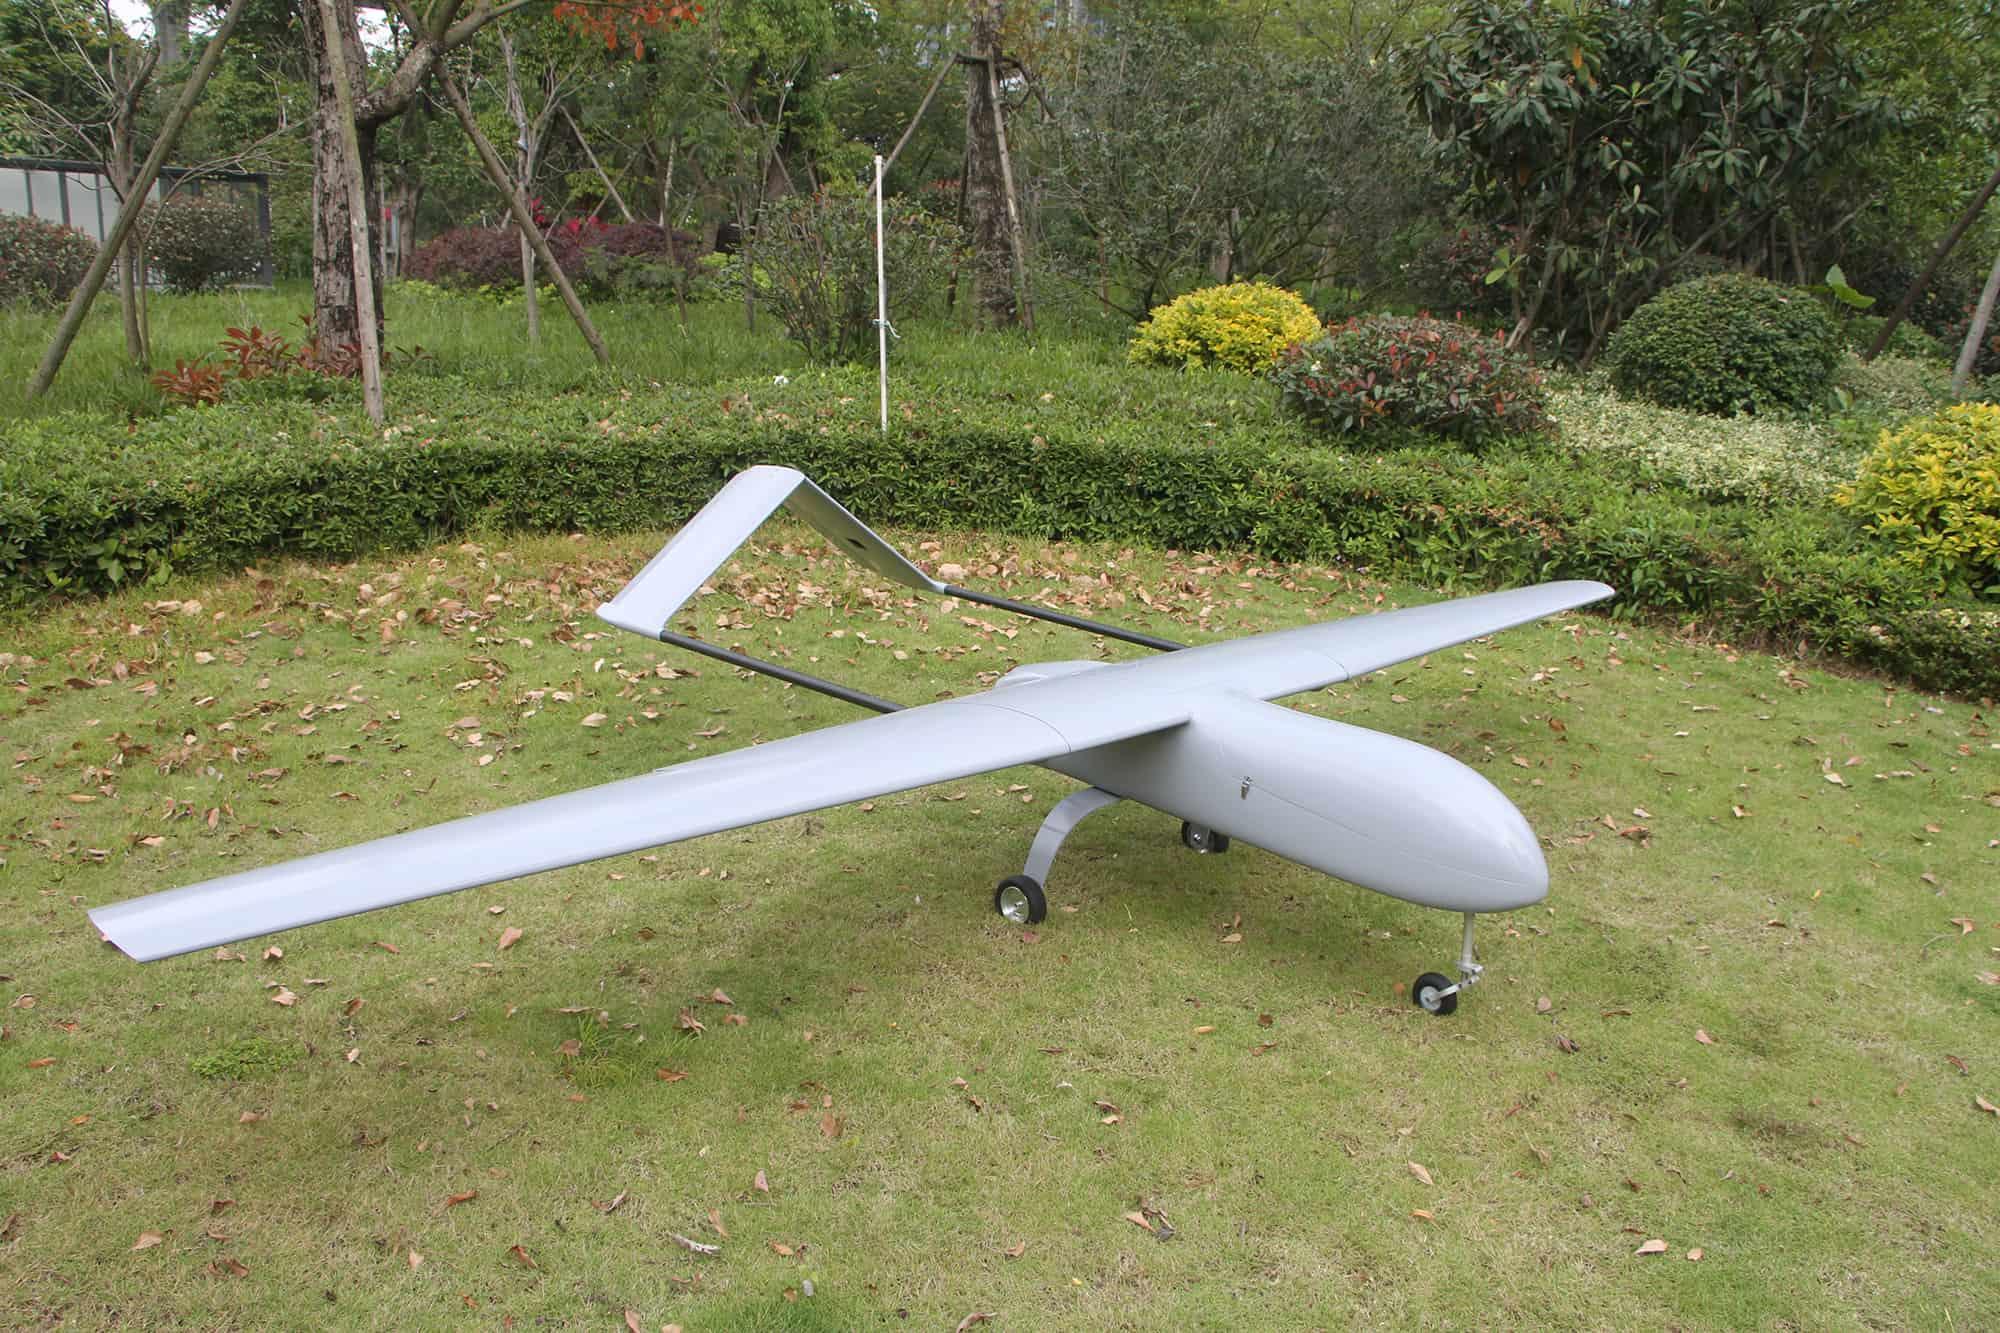 БПЛА Mugin Plus 4500mm FPV Plane